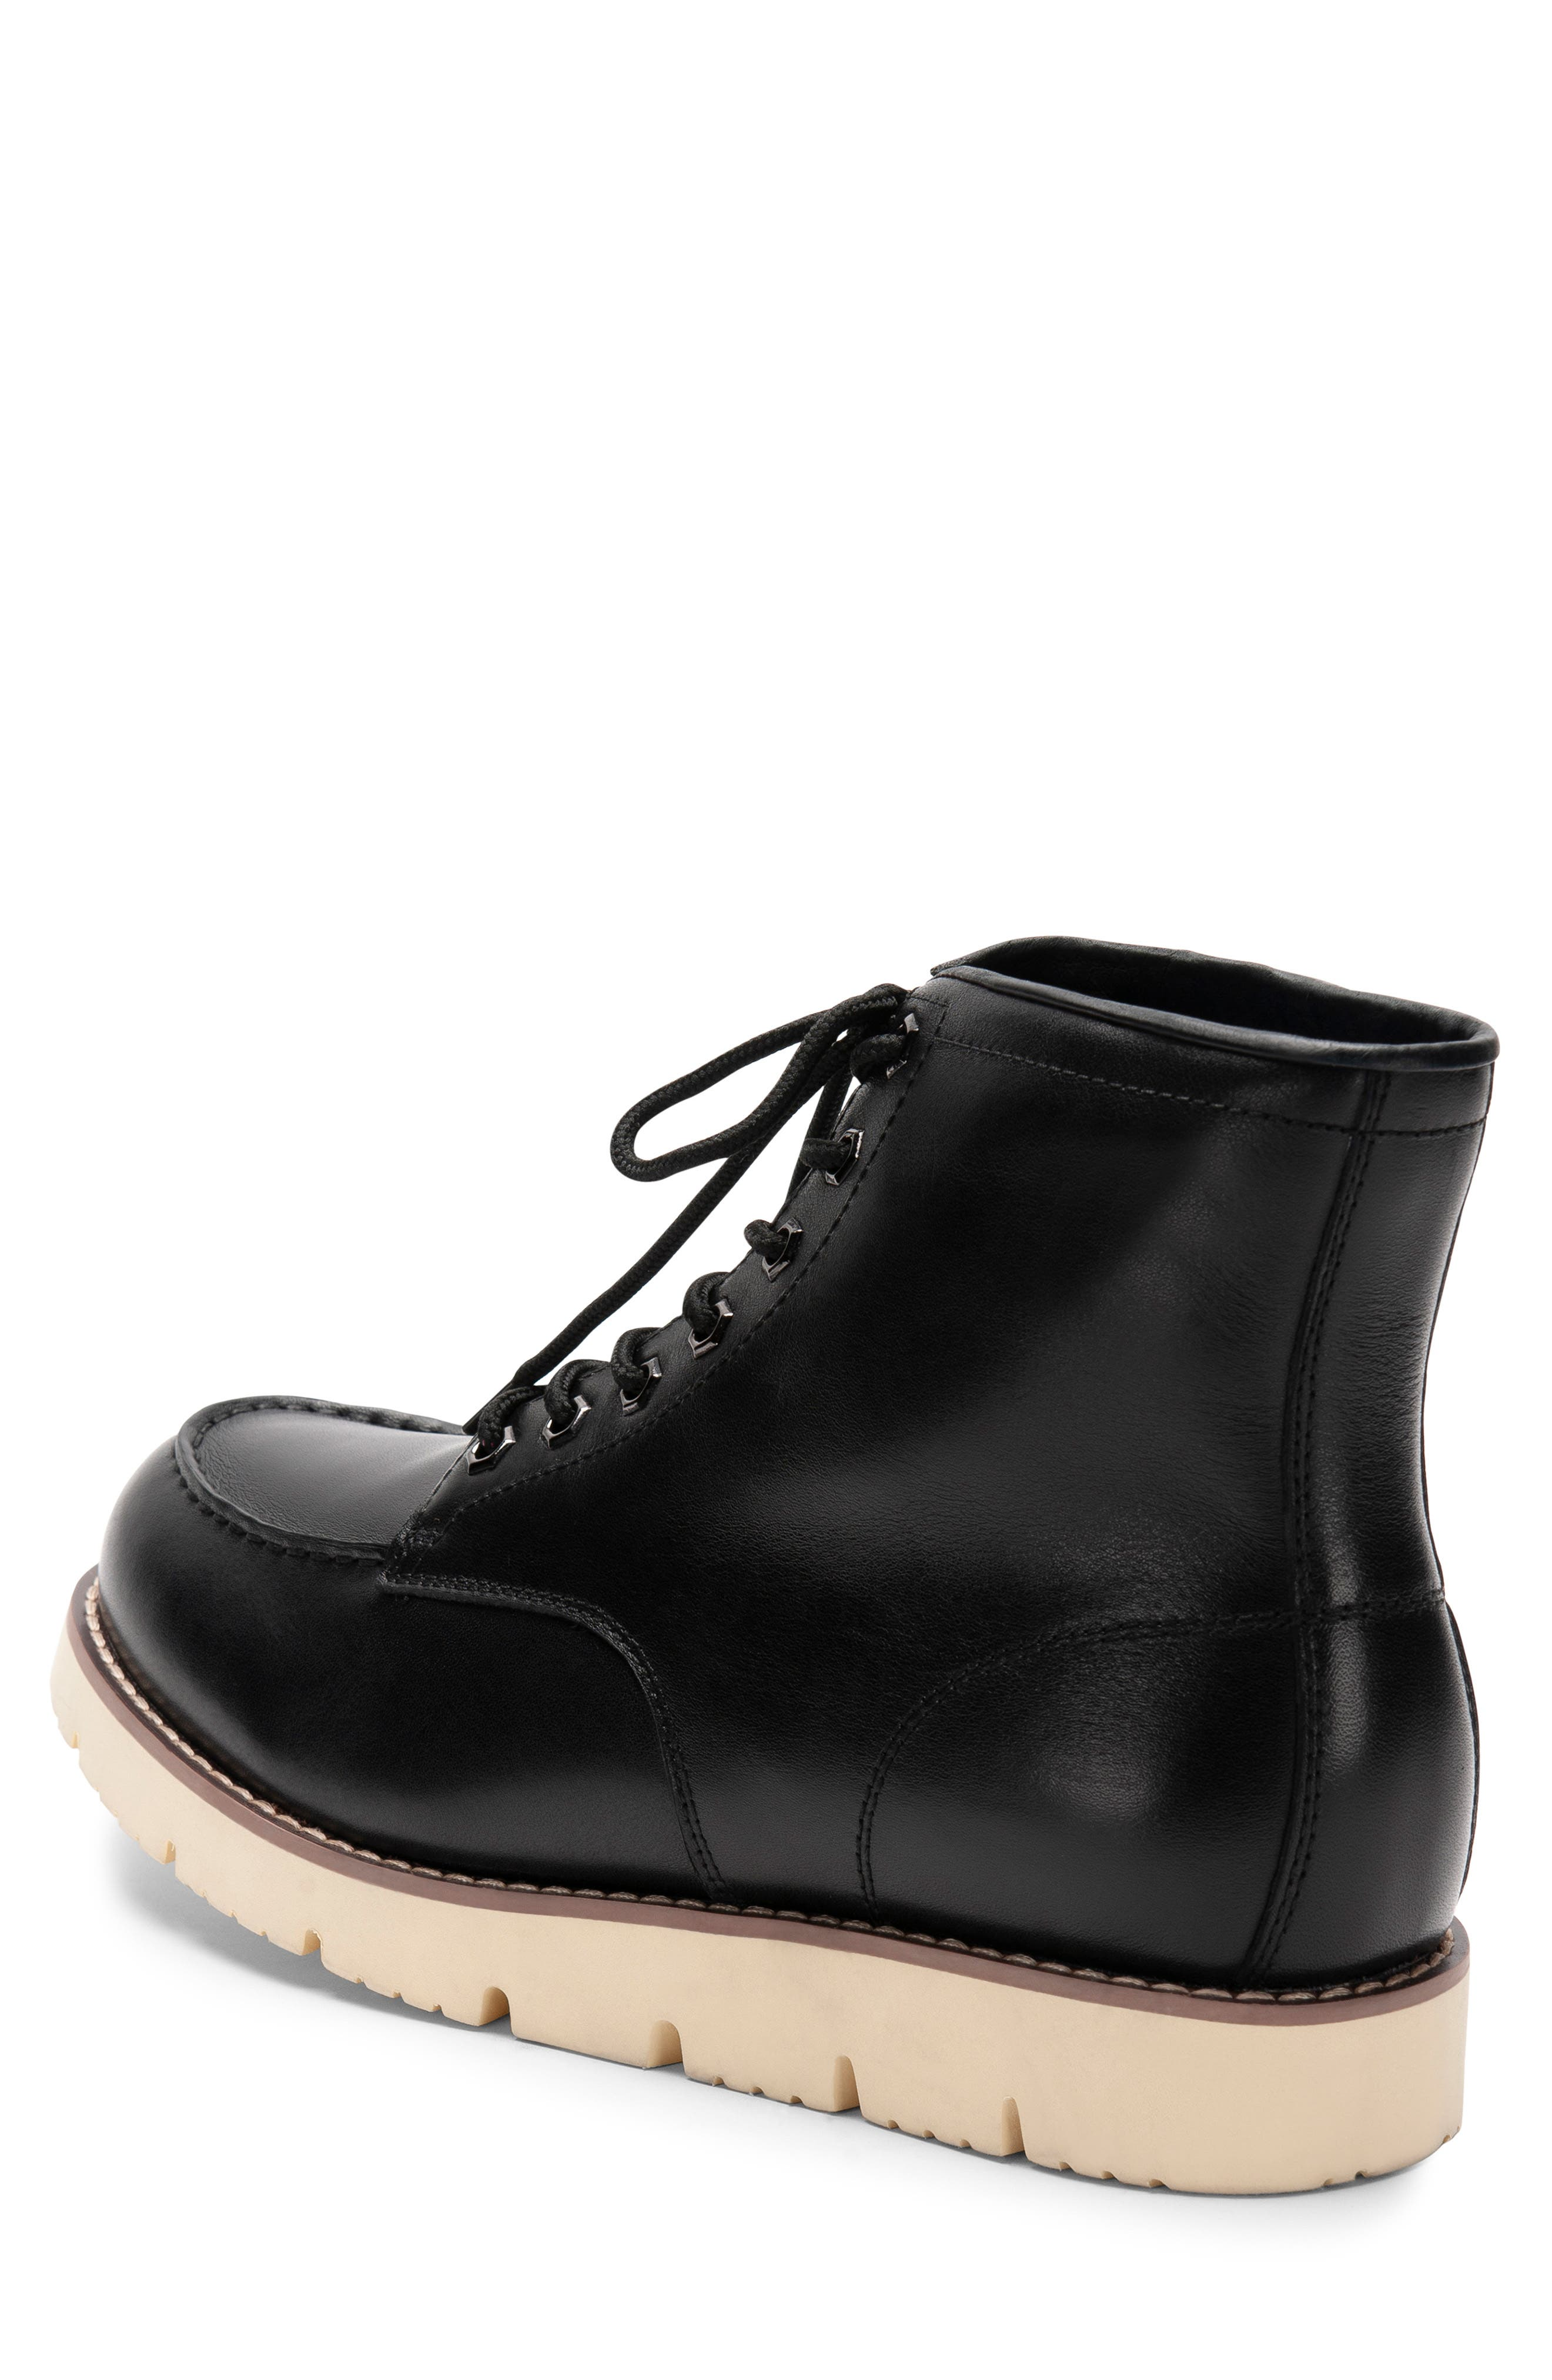 BLONDO, Mario Waterproof Moc Toe Boot, Alternate thumbnail 2, color, BLACK LEATHER